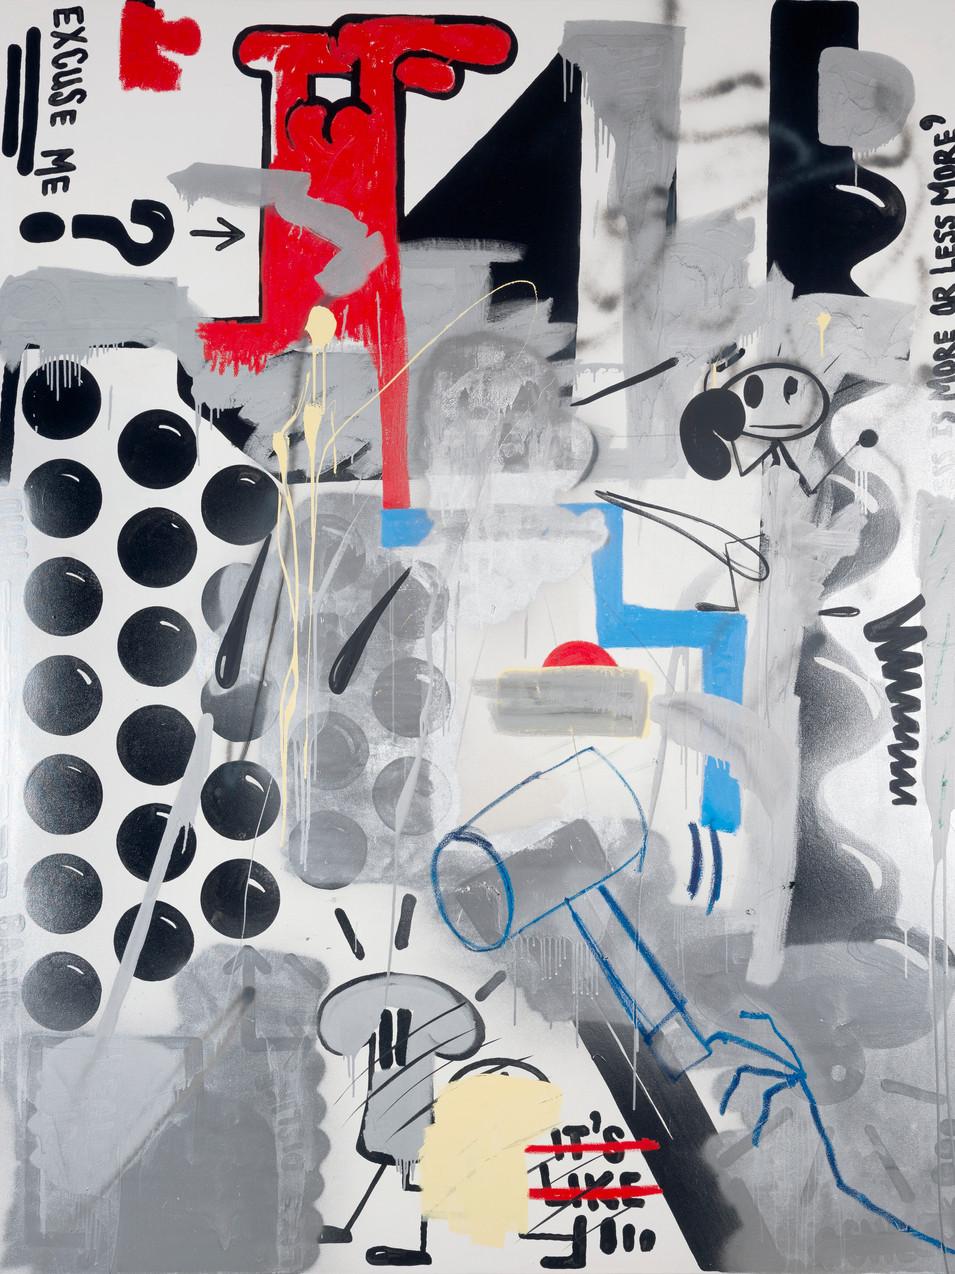 Oliver Kossack | Drip Wars (He had a third Martini) | Flat Balls, flattened | 2015 | Öl, Acryl, Sprühlack auf Leinwand | 260 x 200 cm | 15000 Euro